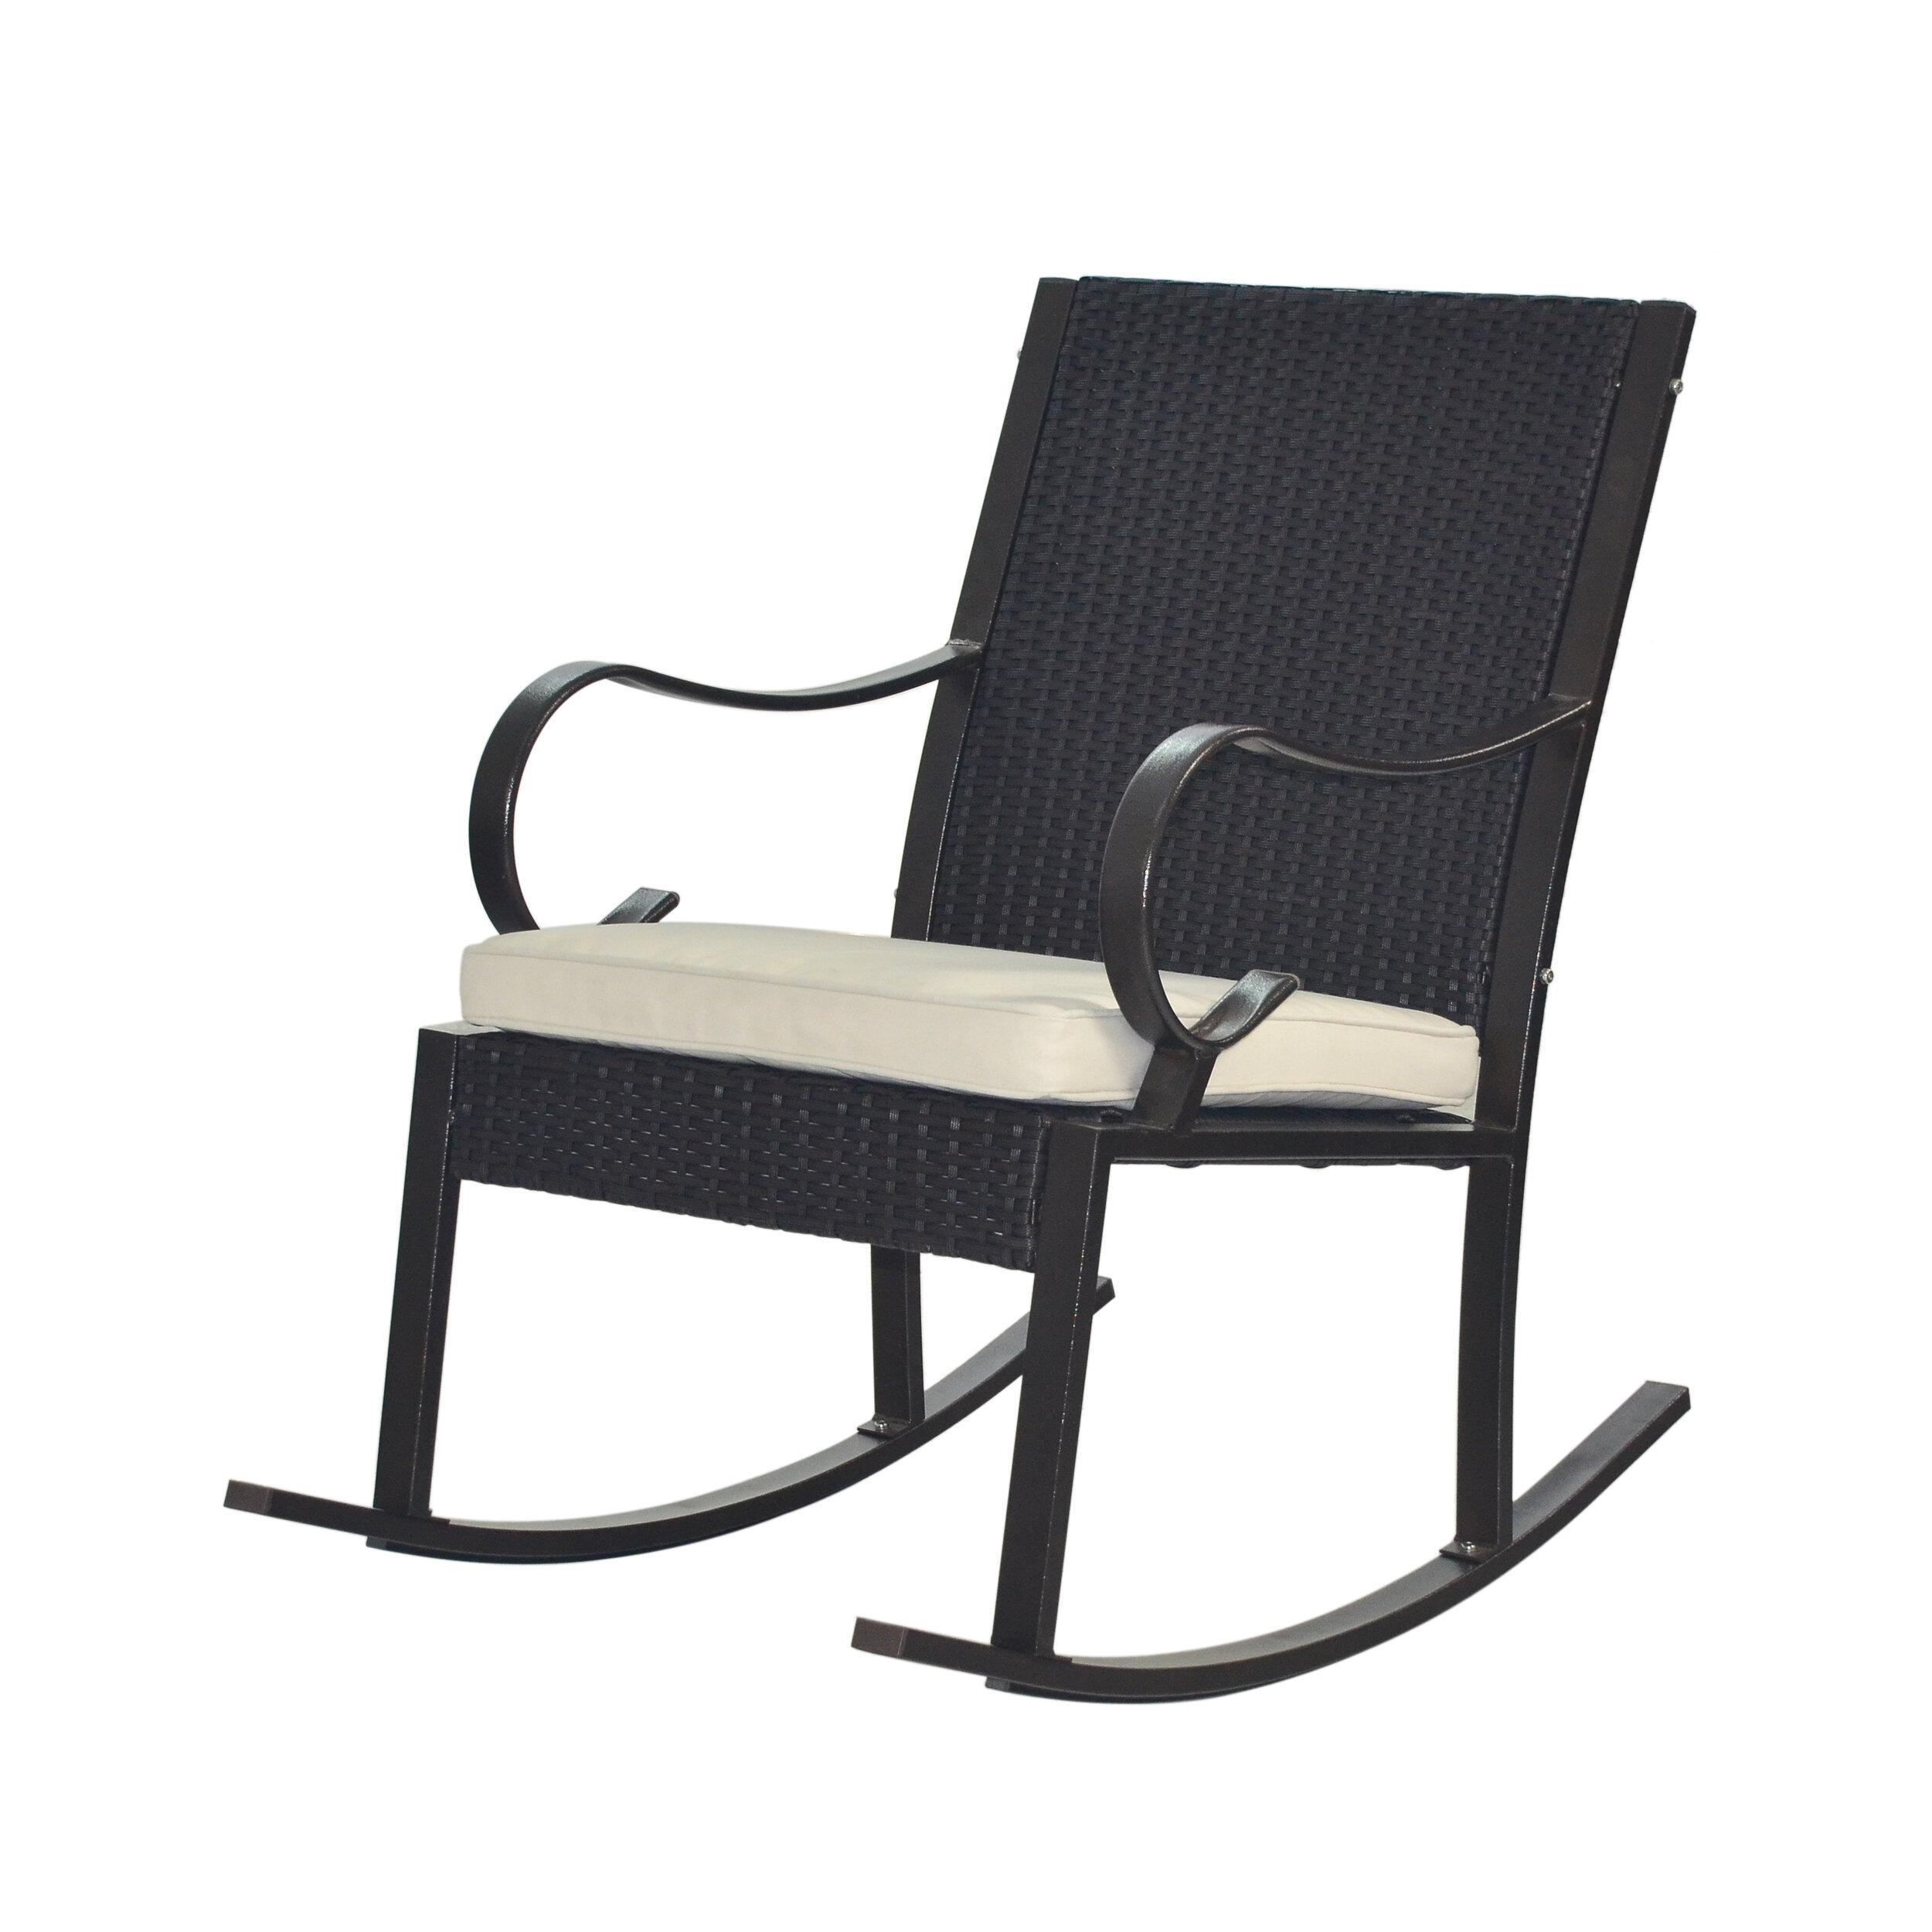 Kampmann Outdoor Wicker Rocking Chair